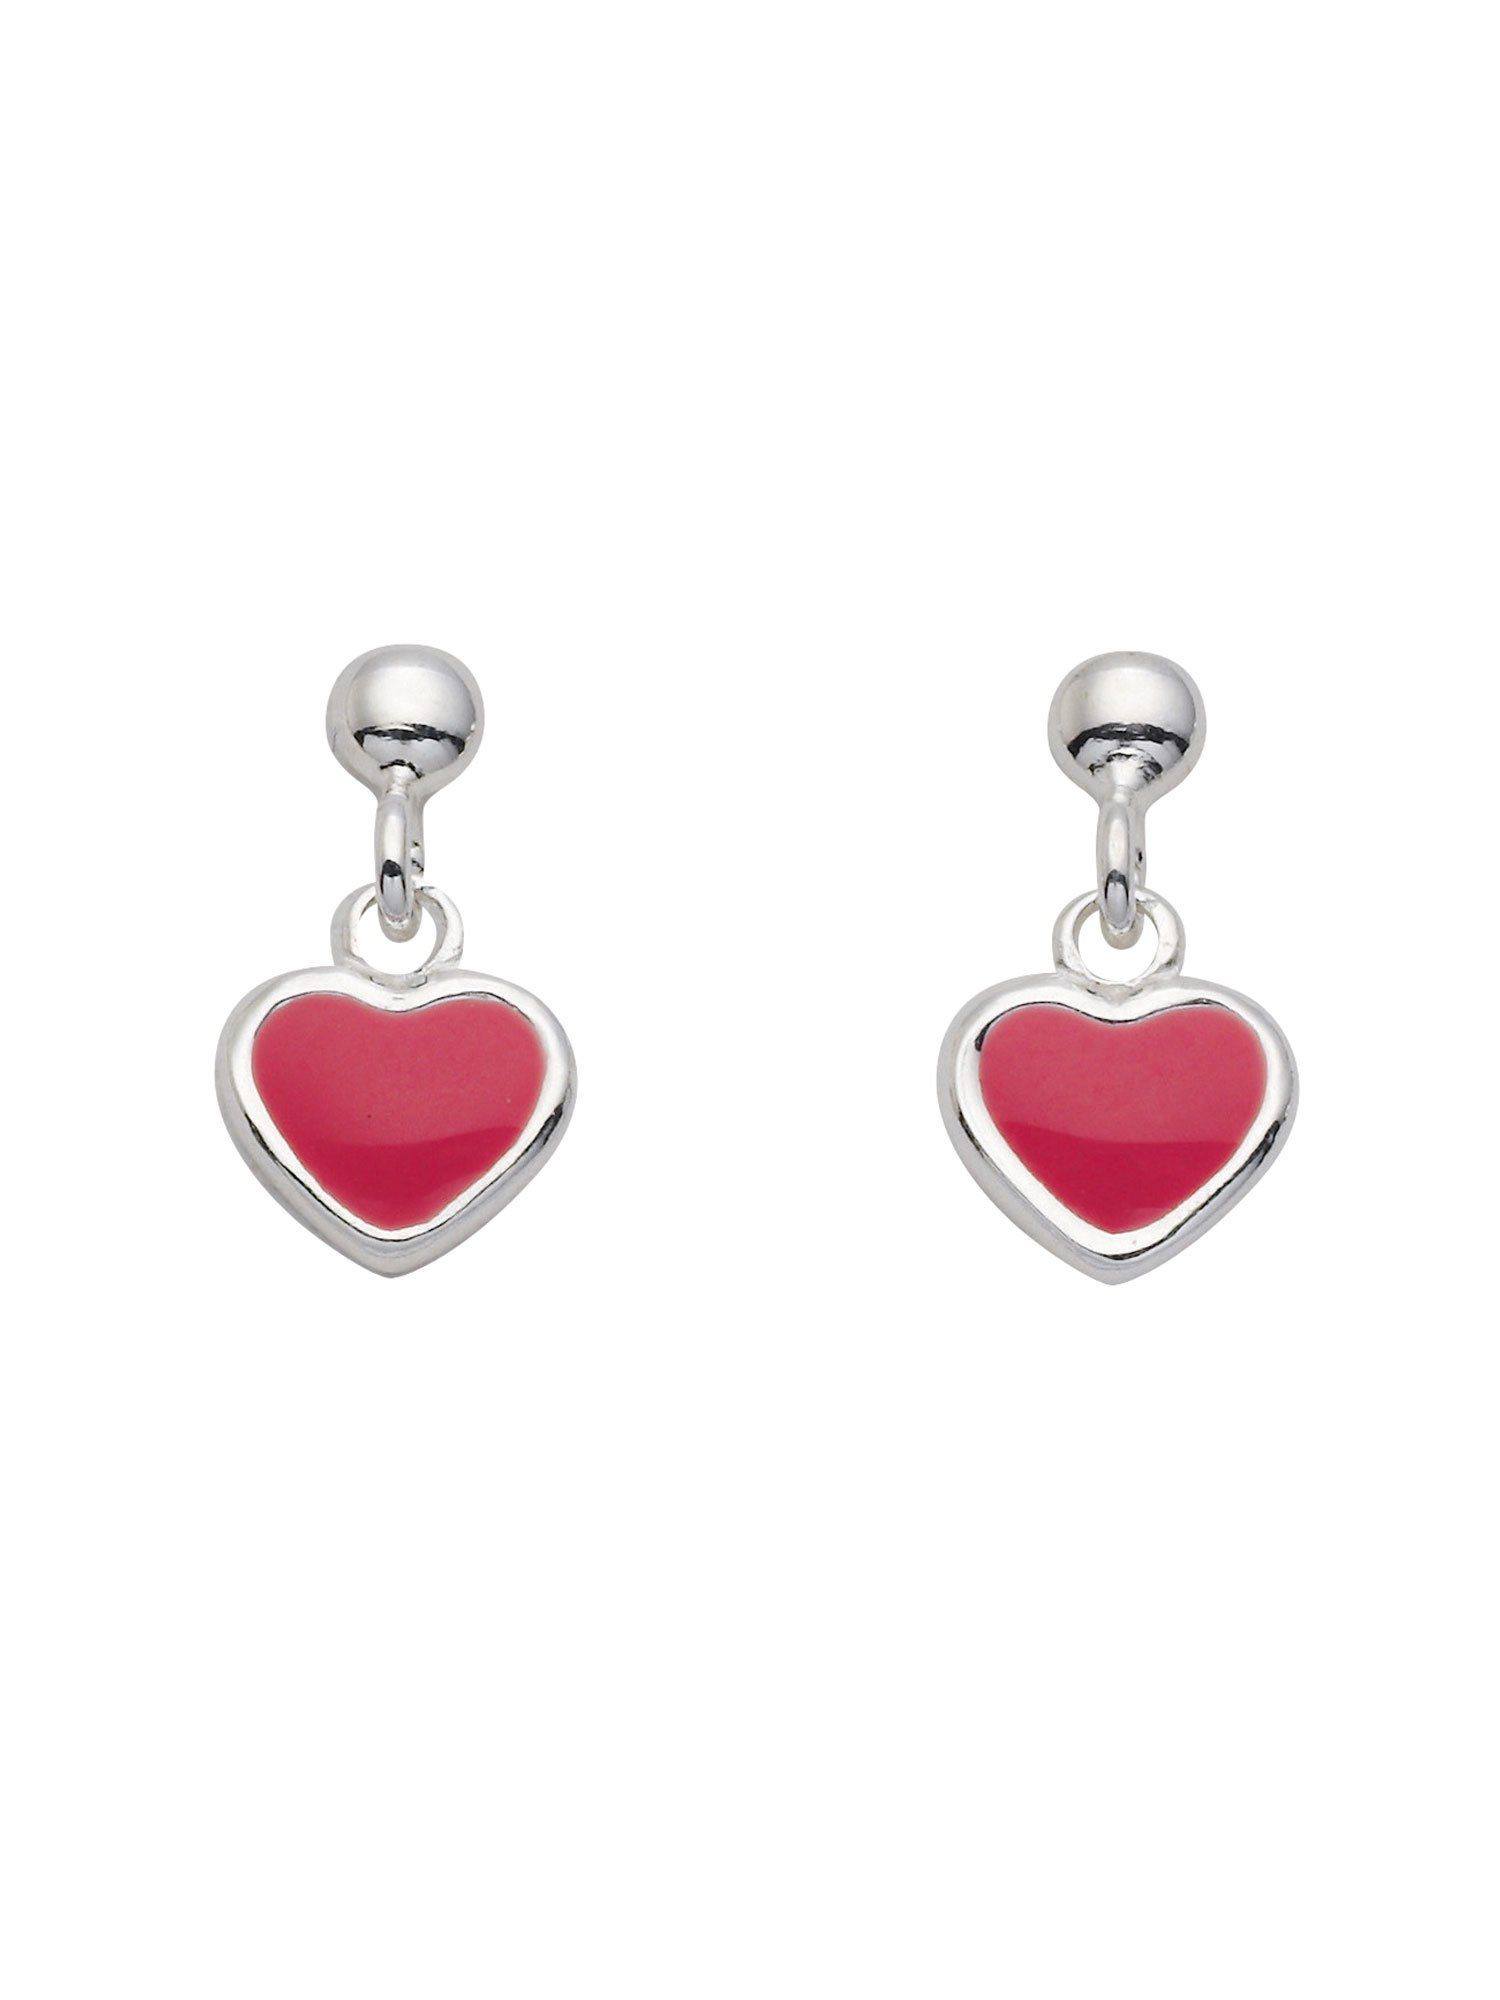 Adelia´s Paar Ohrhänger »Silber 925 Sterling Silver Ohrringe - Ohrhänger« Herz 925 Sterling Silber